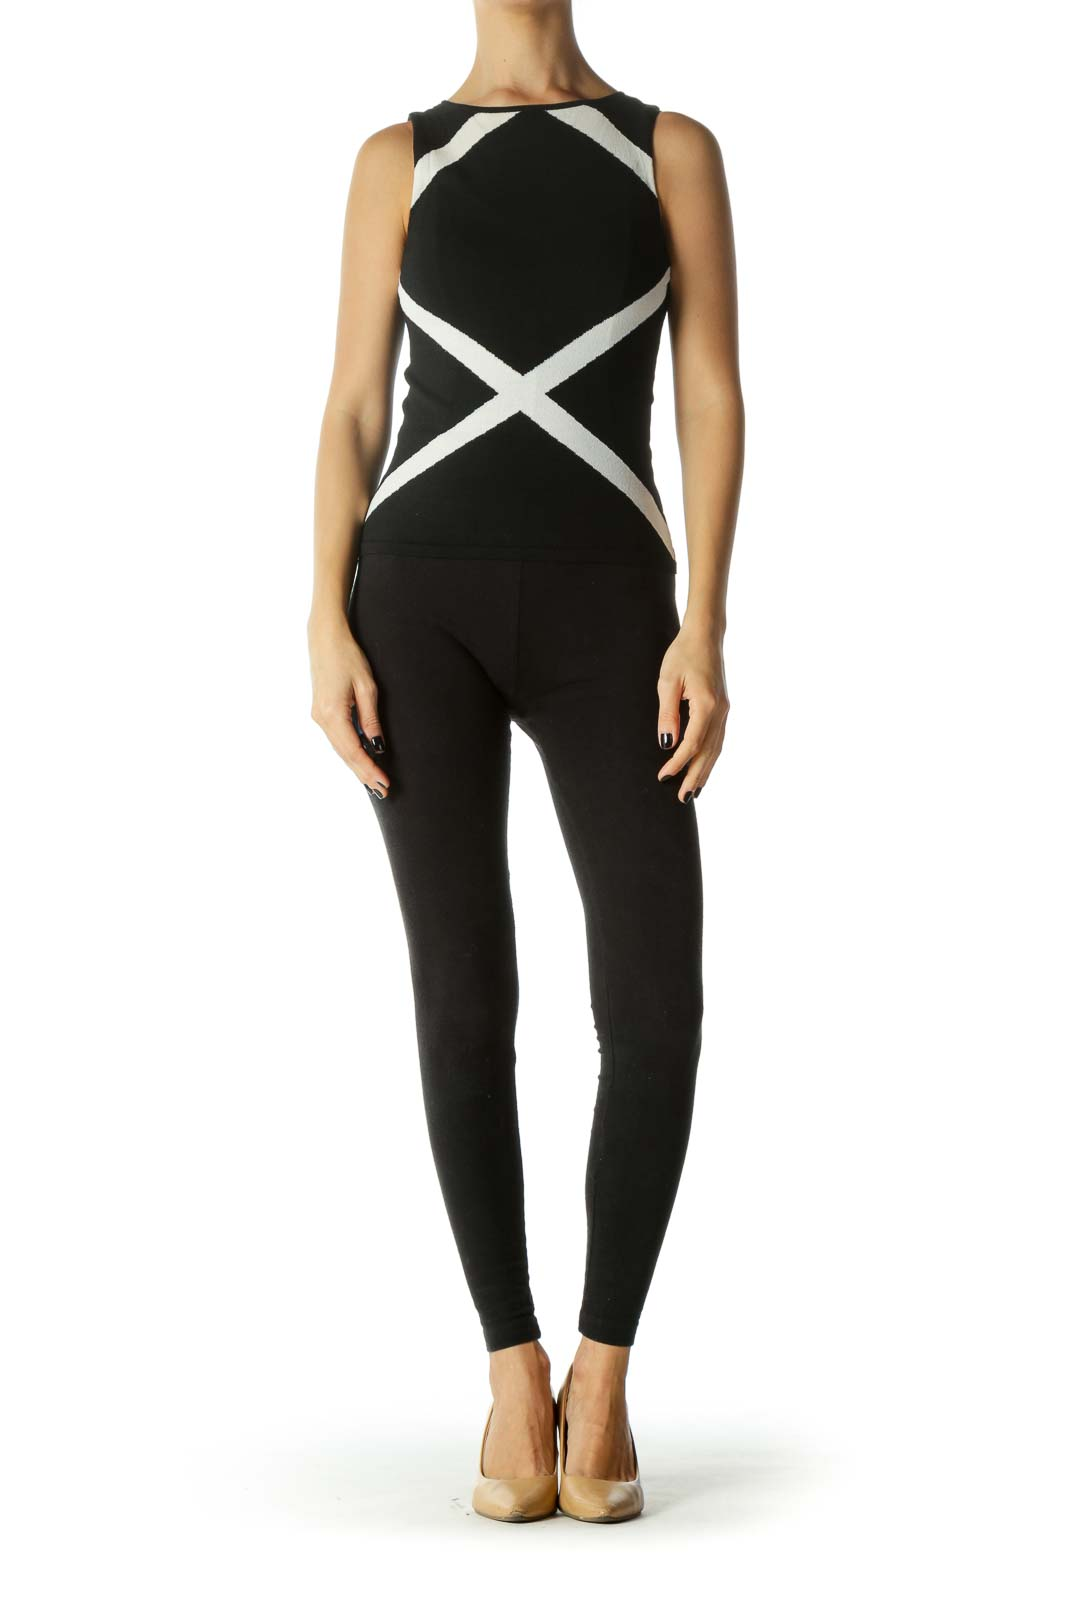 Black & White Sleeveless Stretch Round Neck Top